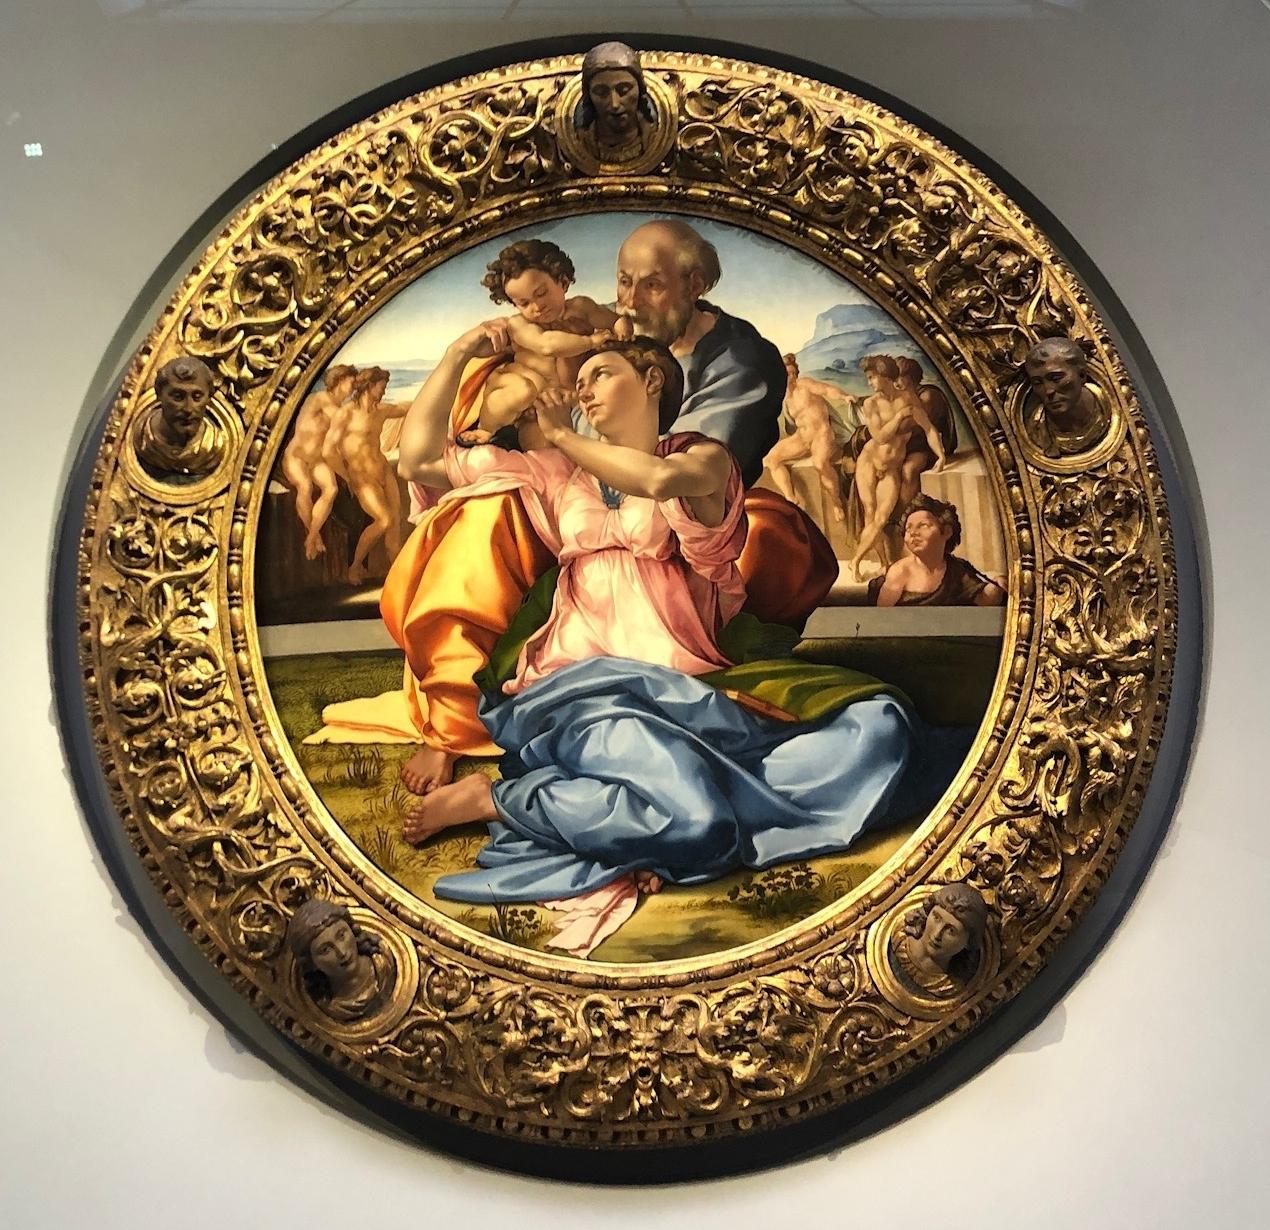 Doni Tondo, circa 1507, oil and tempera on panel by Michelangelo at the Uffizi Museum.